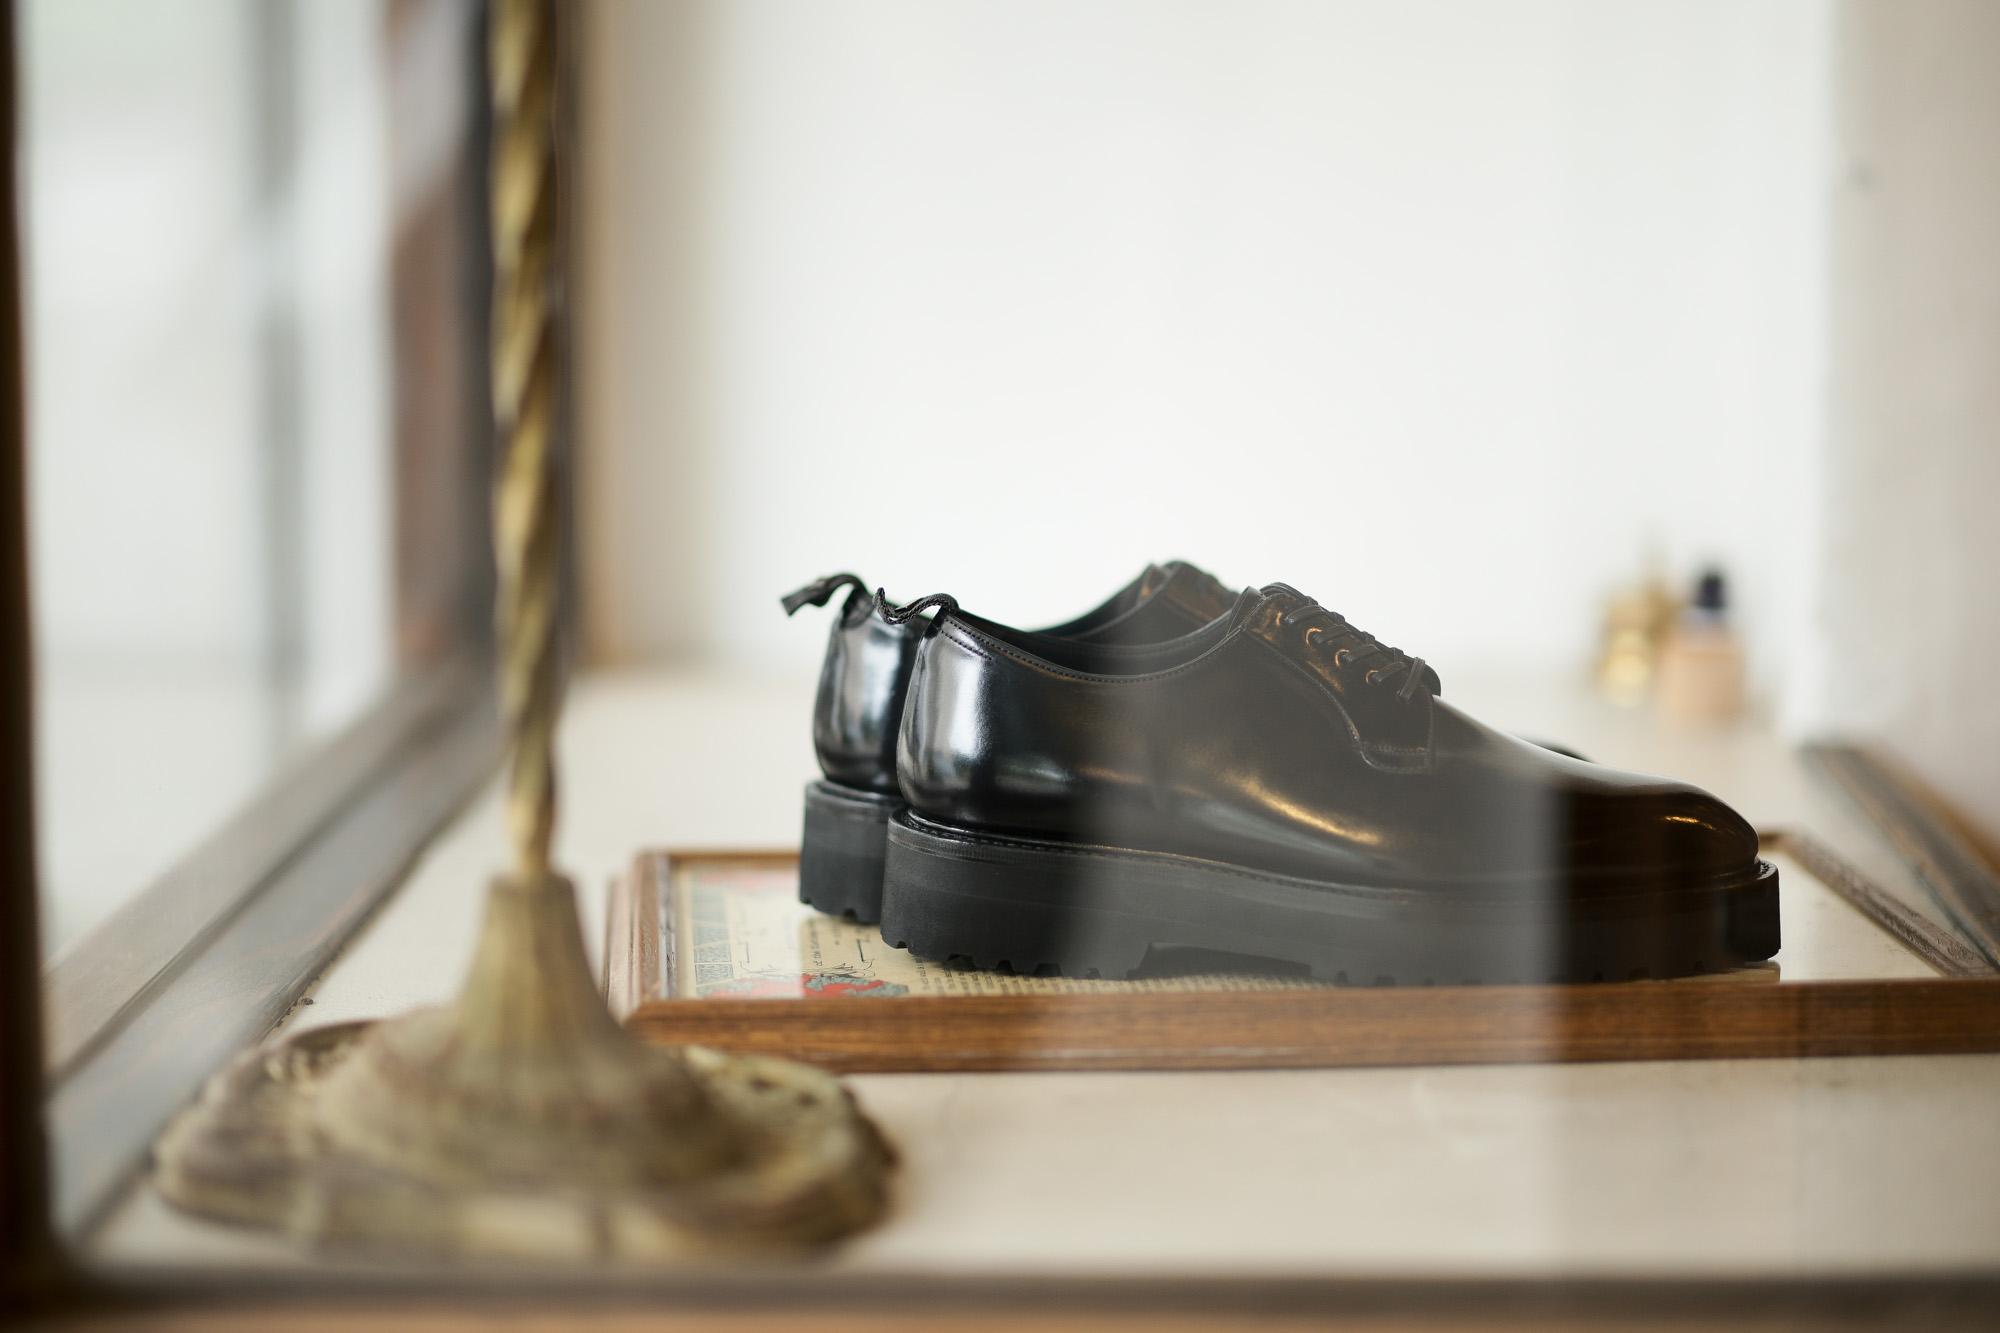 WH (ダブルエイチ) WHZ-0011 Cordovan Plane Toe Shoes (干場氏 スペシャル Zモデル) Trench Last (トレンチラスト) Shell Cordovan シェルコードバンレザー プレーントゥシューズ BLACK (ブラック) MADE IN JAPAN (日本製) 2019 秋冬 【Special限定モデル】【7月27日発売分】【ご予約受付中】愛知 名古屋 alto e diritto altoediritto アルトエデリット 干場義雅 干場さん